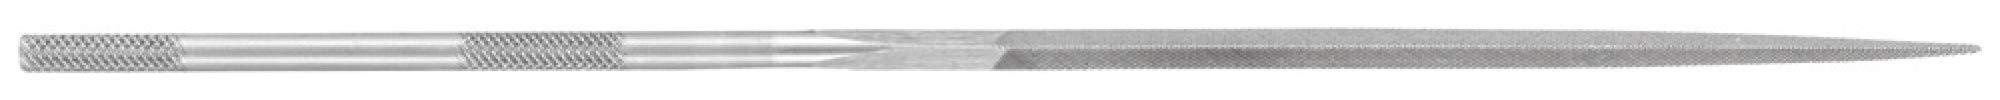 PFERD 12009 6-1/4'' Three Square Needle File Knurled Handle, Cut 0 (12pk)